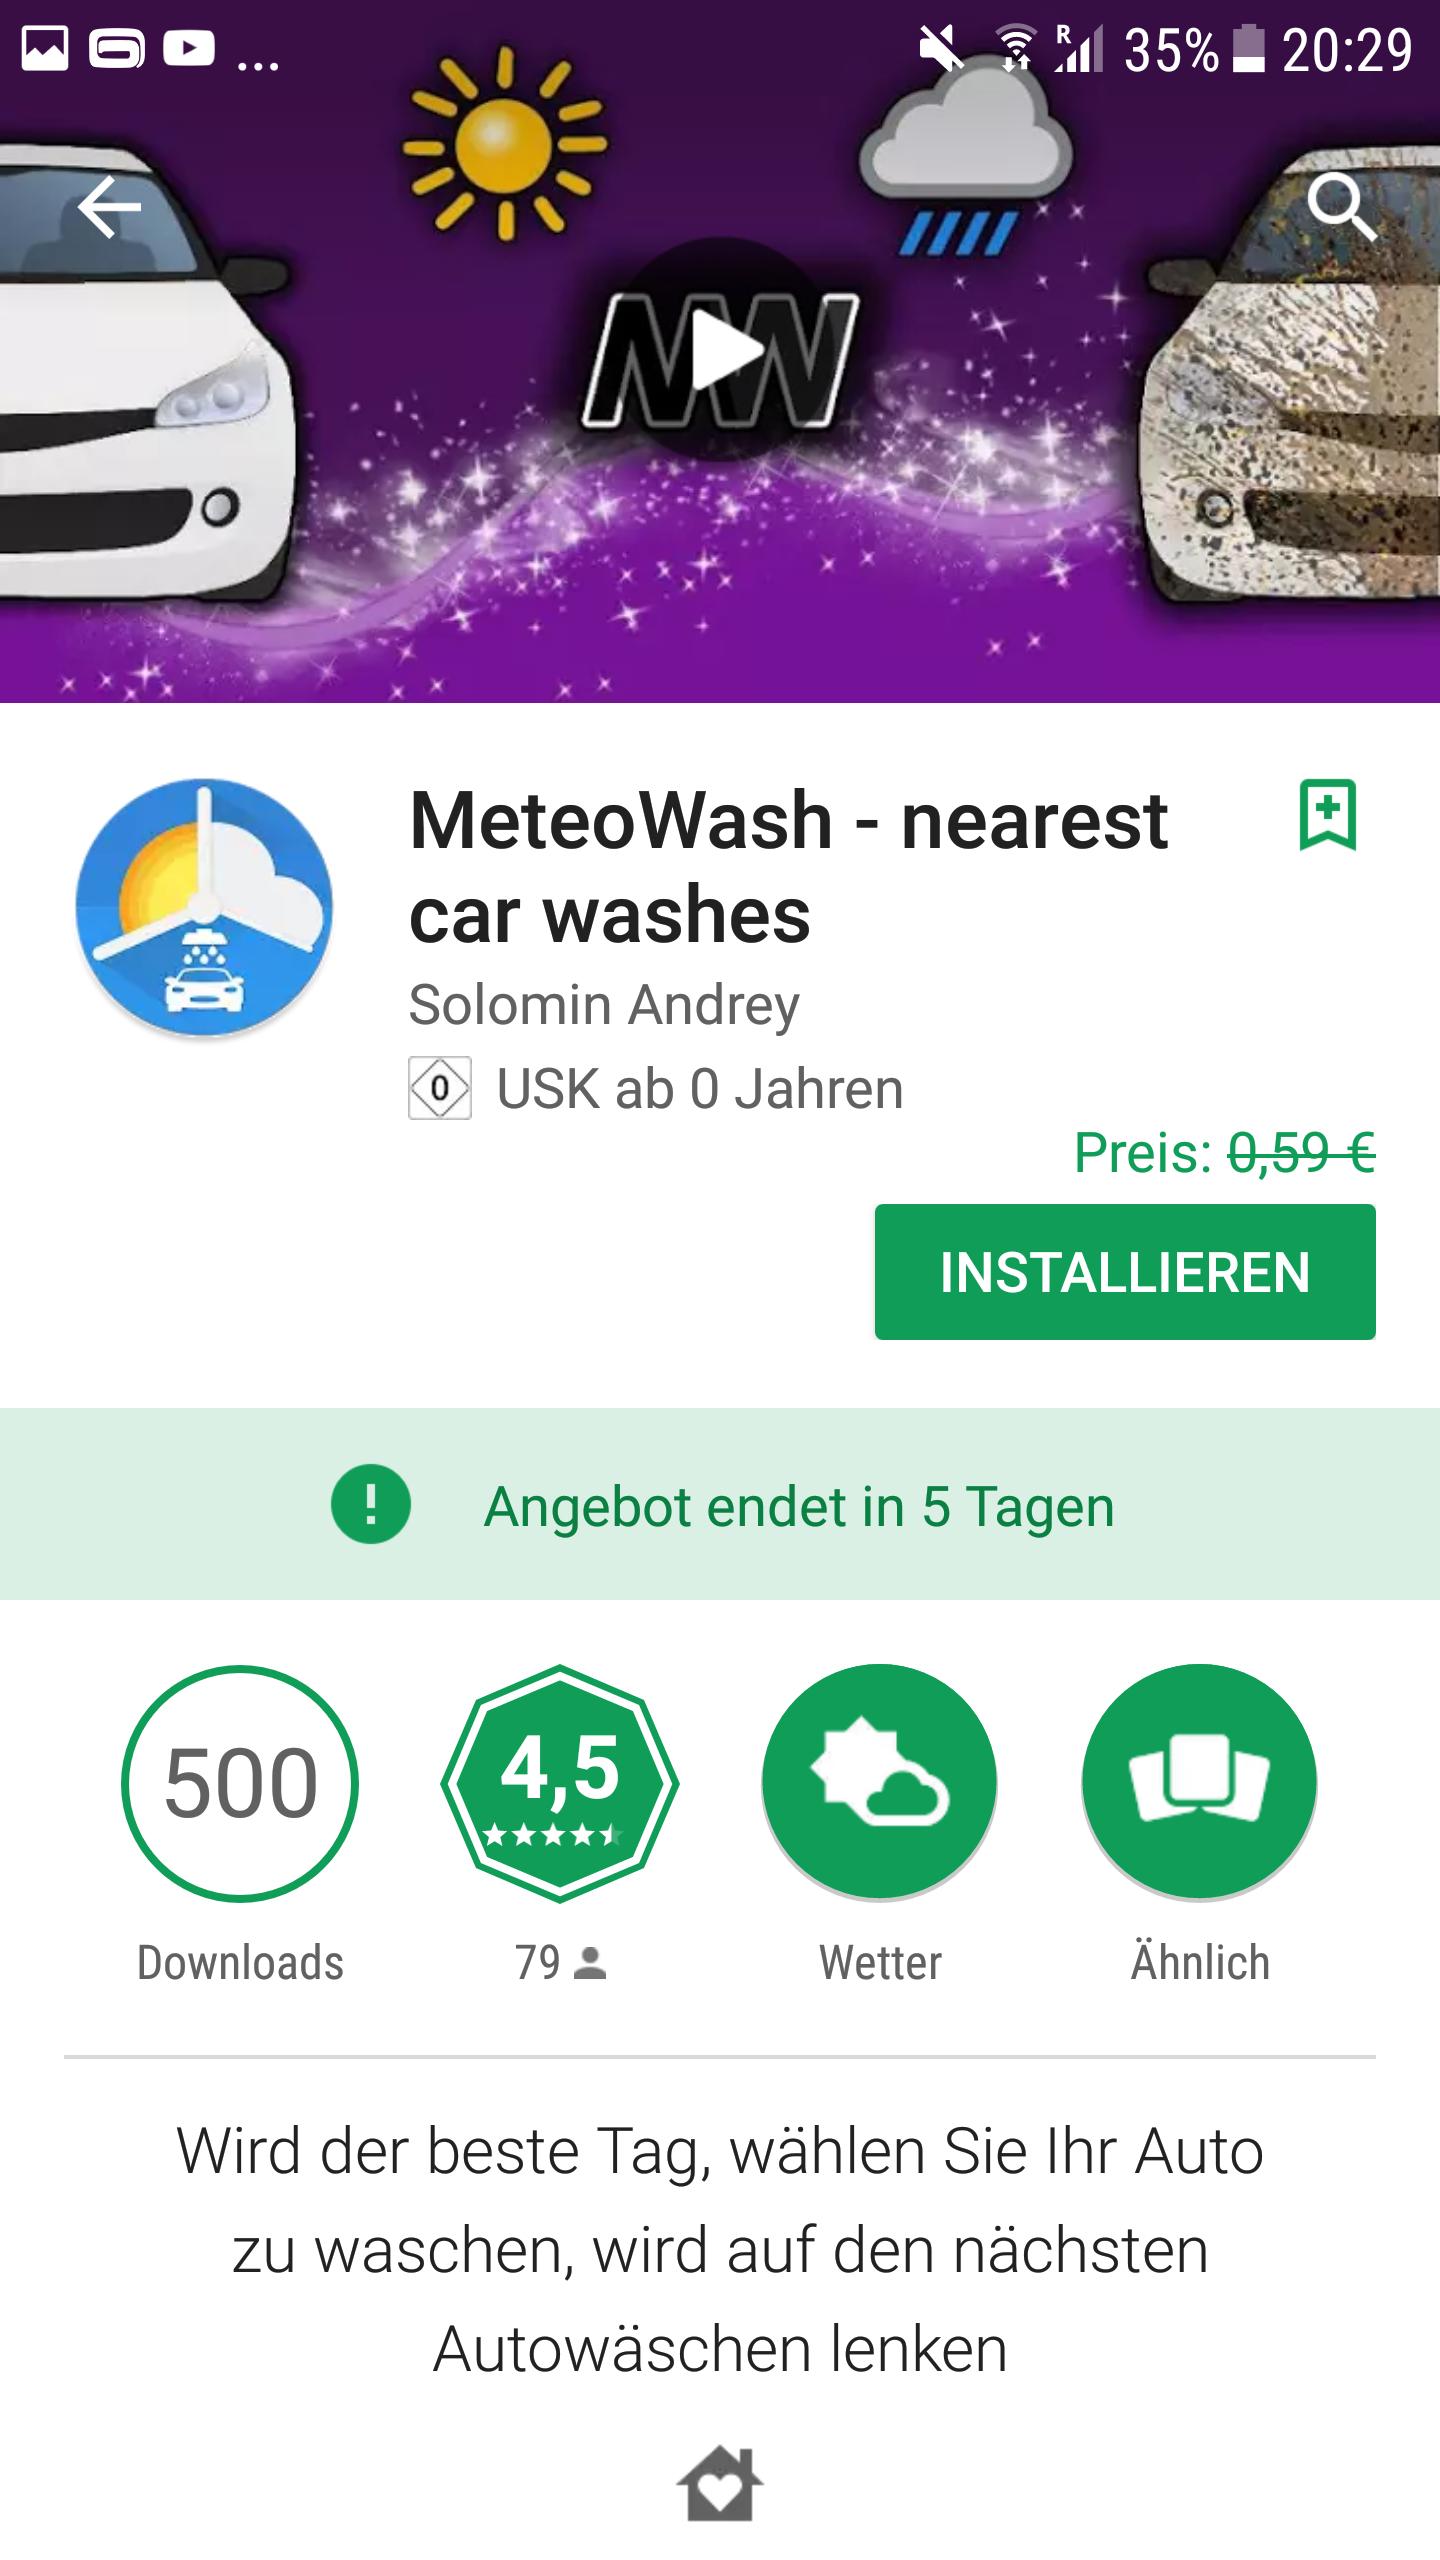 2 Google Play Store Freebies und 1 reduzierte App(Android)